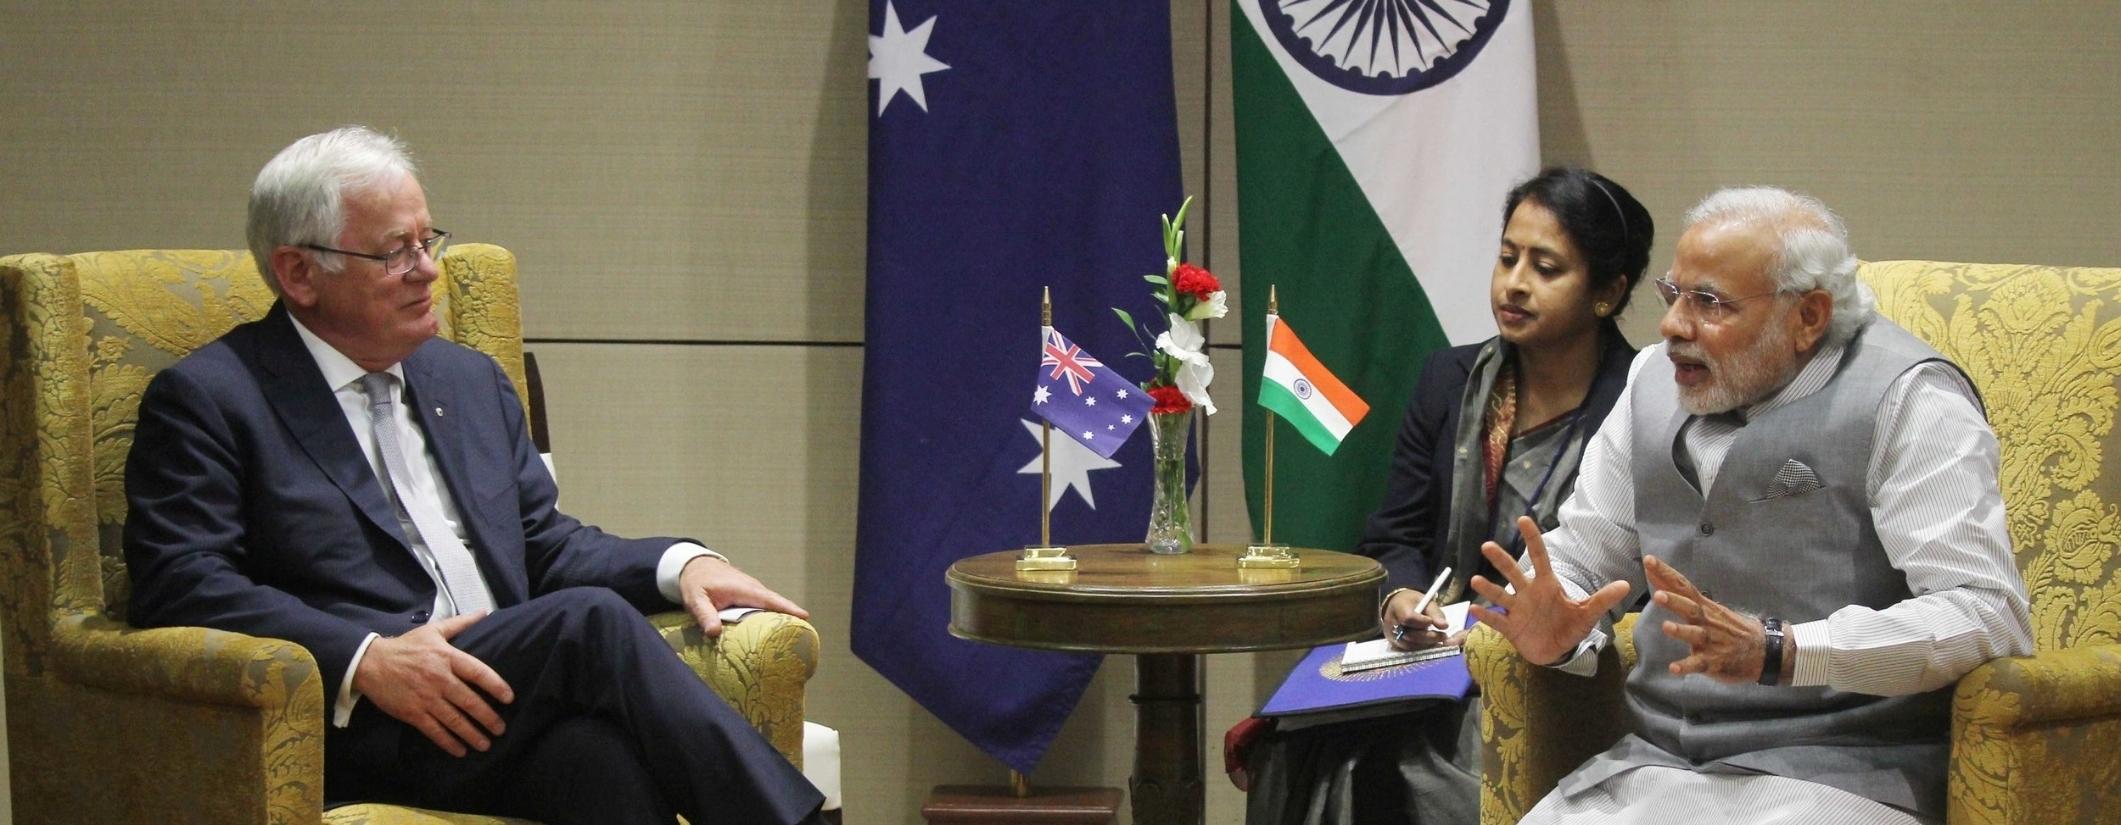 Andrew Robb and Modi.JPG